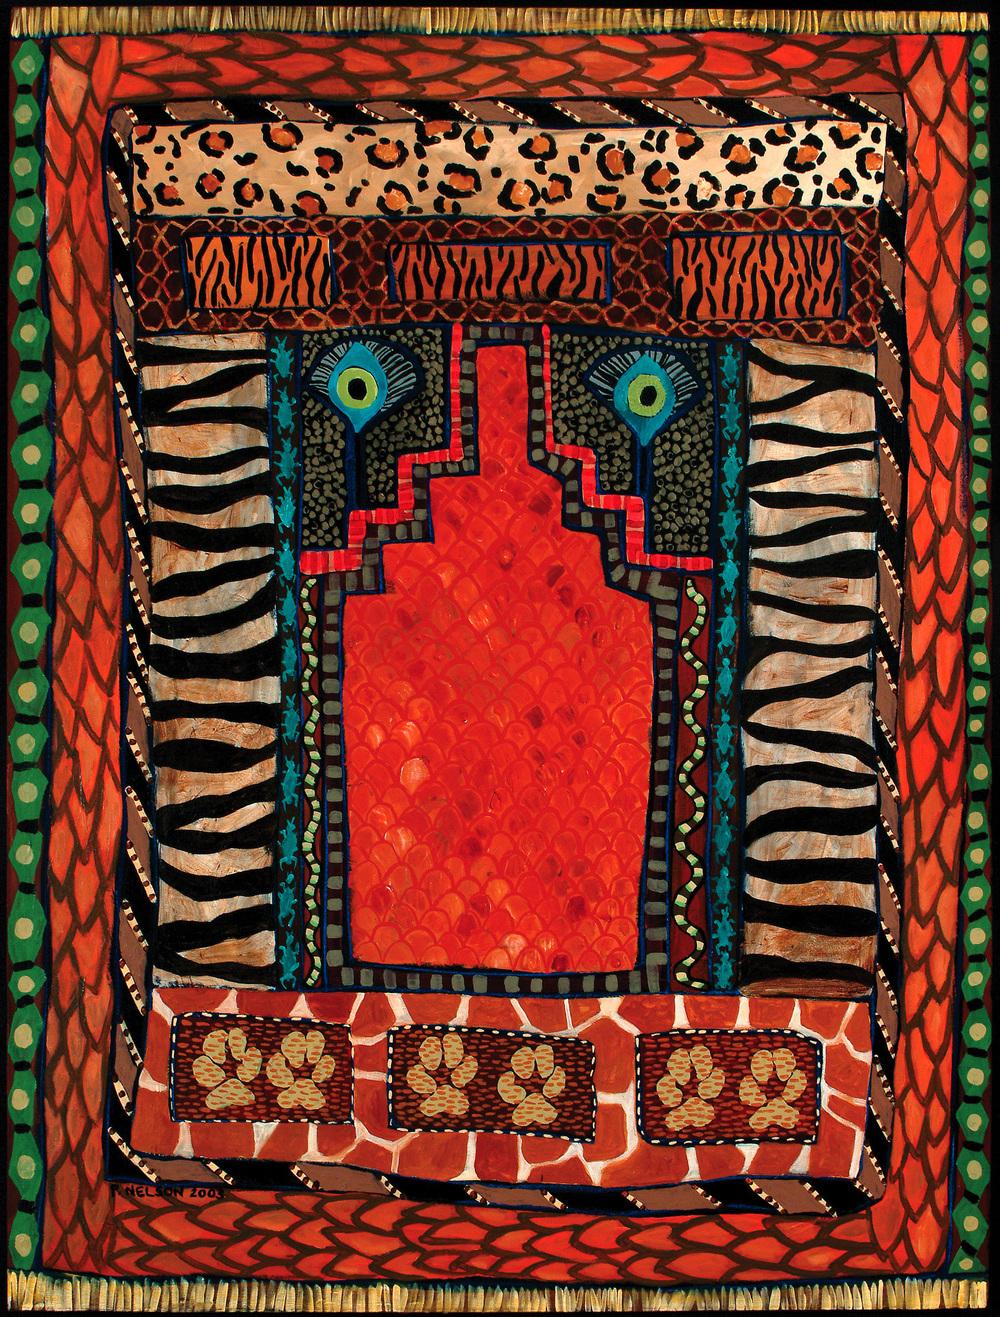 Animal Prayer Rug, copyright (c) Pamela Nelson